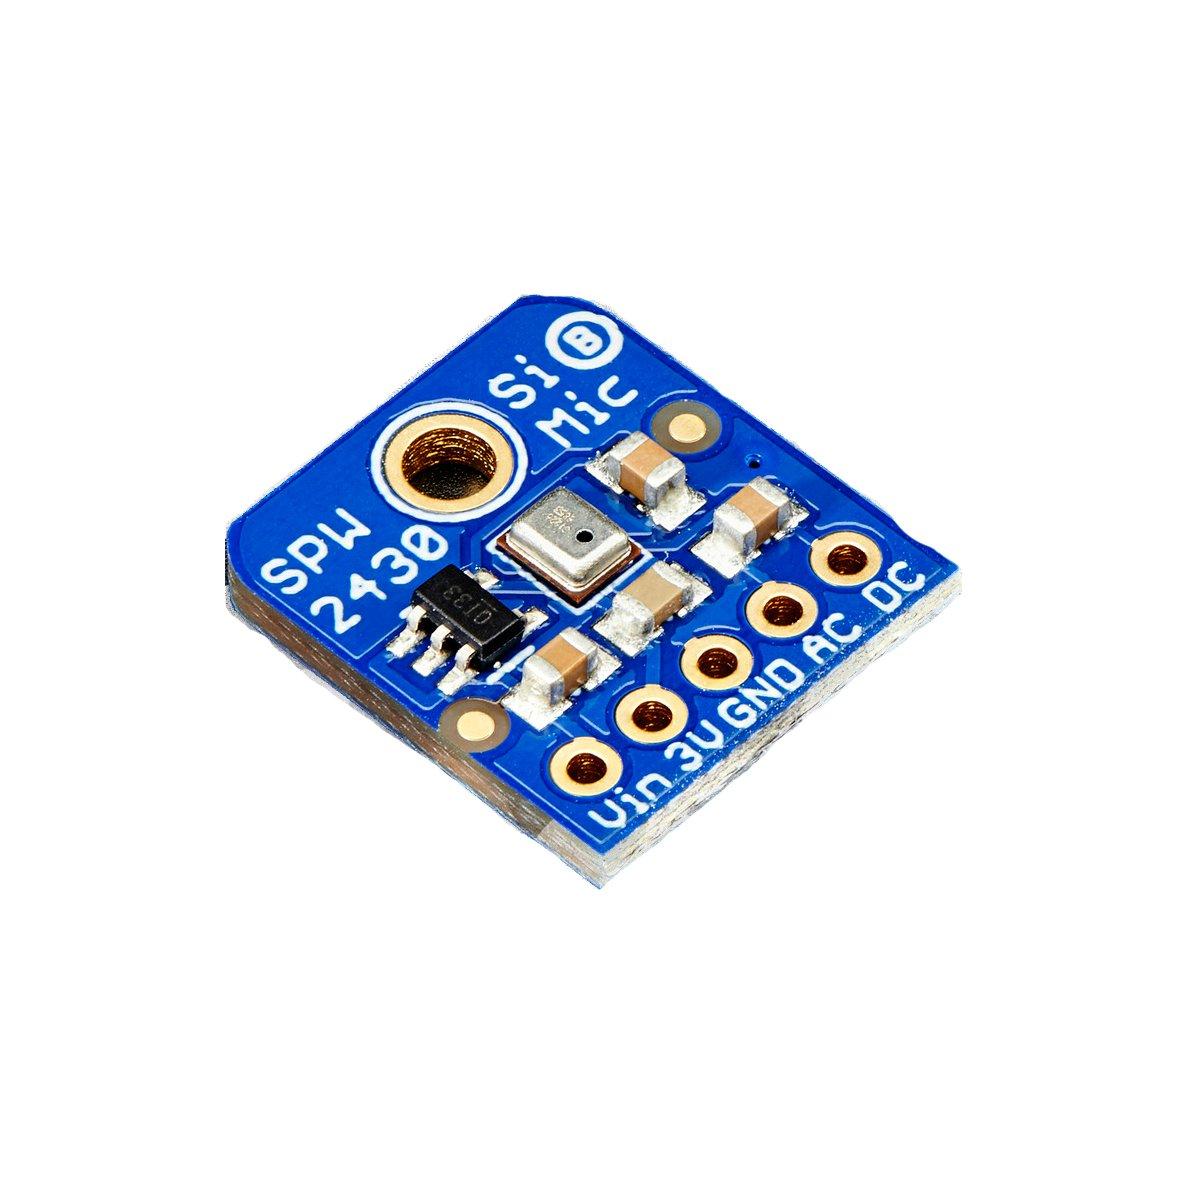 Audio IC Development Tools Adafruit Silicon MEMS Microphone.